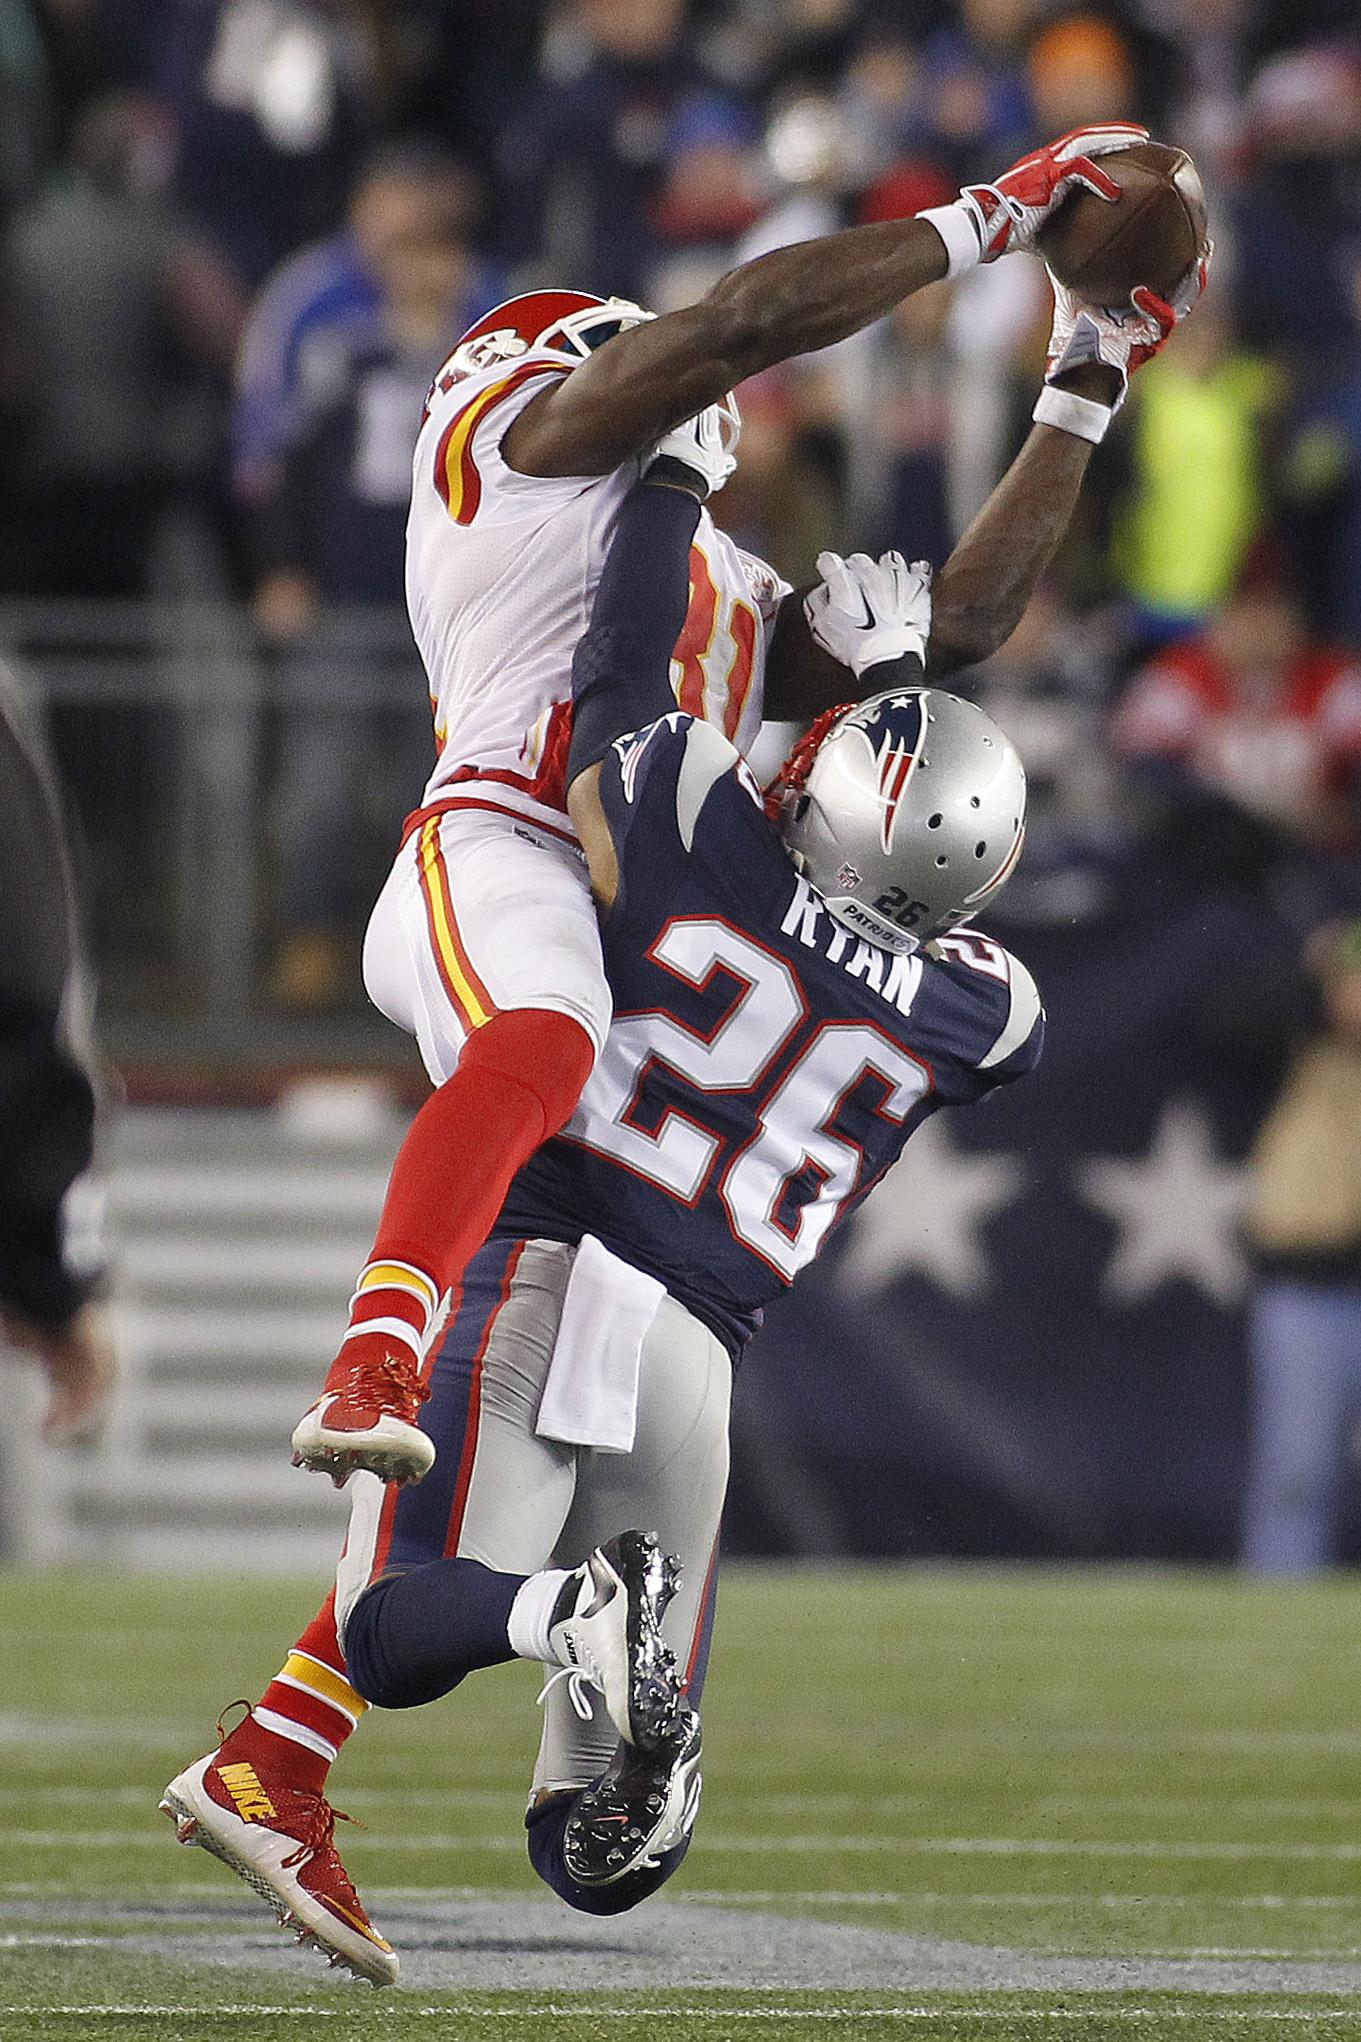 NFL: AFC Divisional-Kansas City Chiefs at New England Patriots